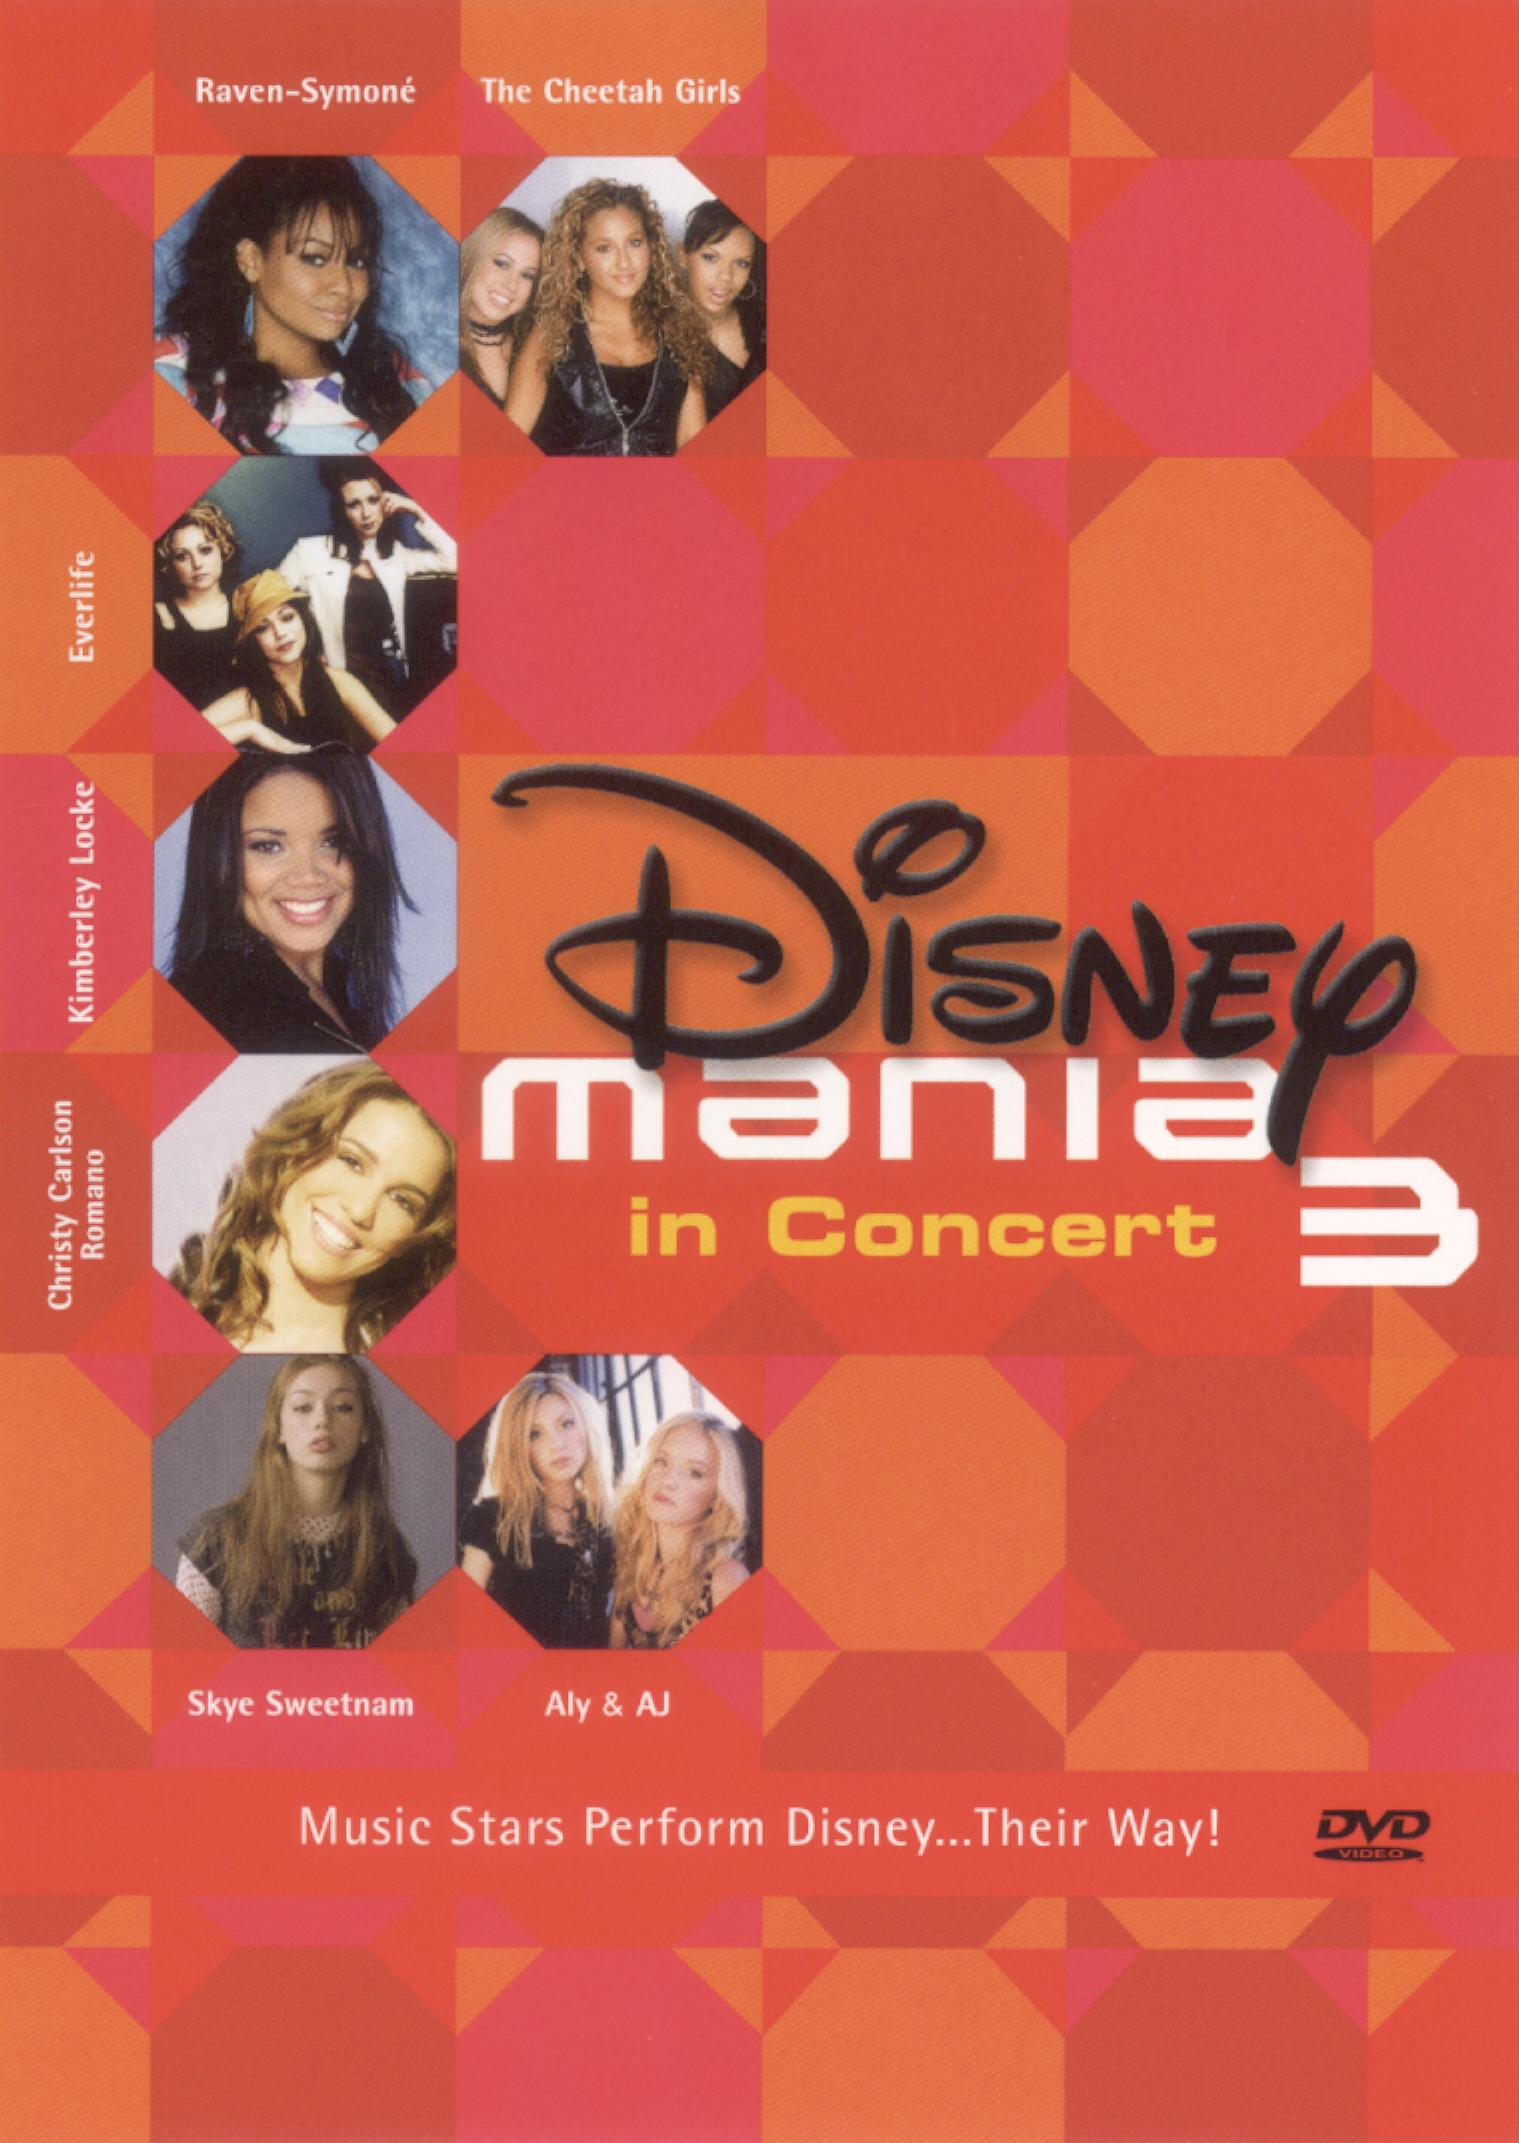 Disneymania in Concert 3